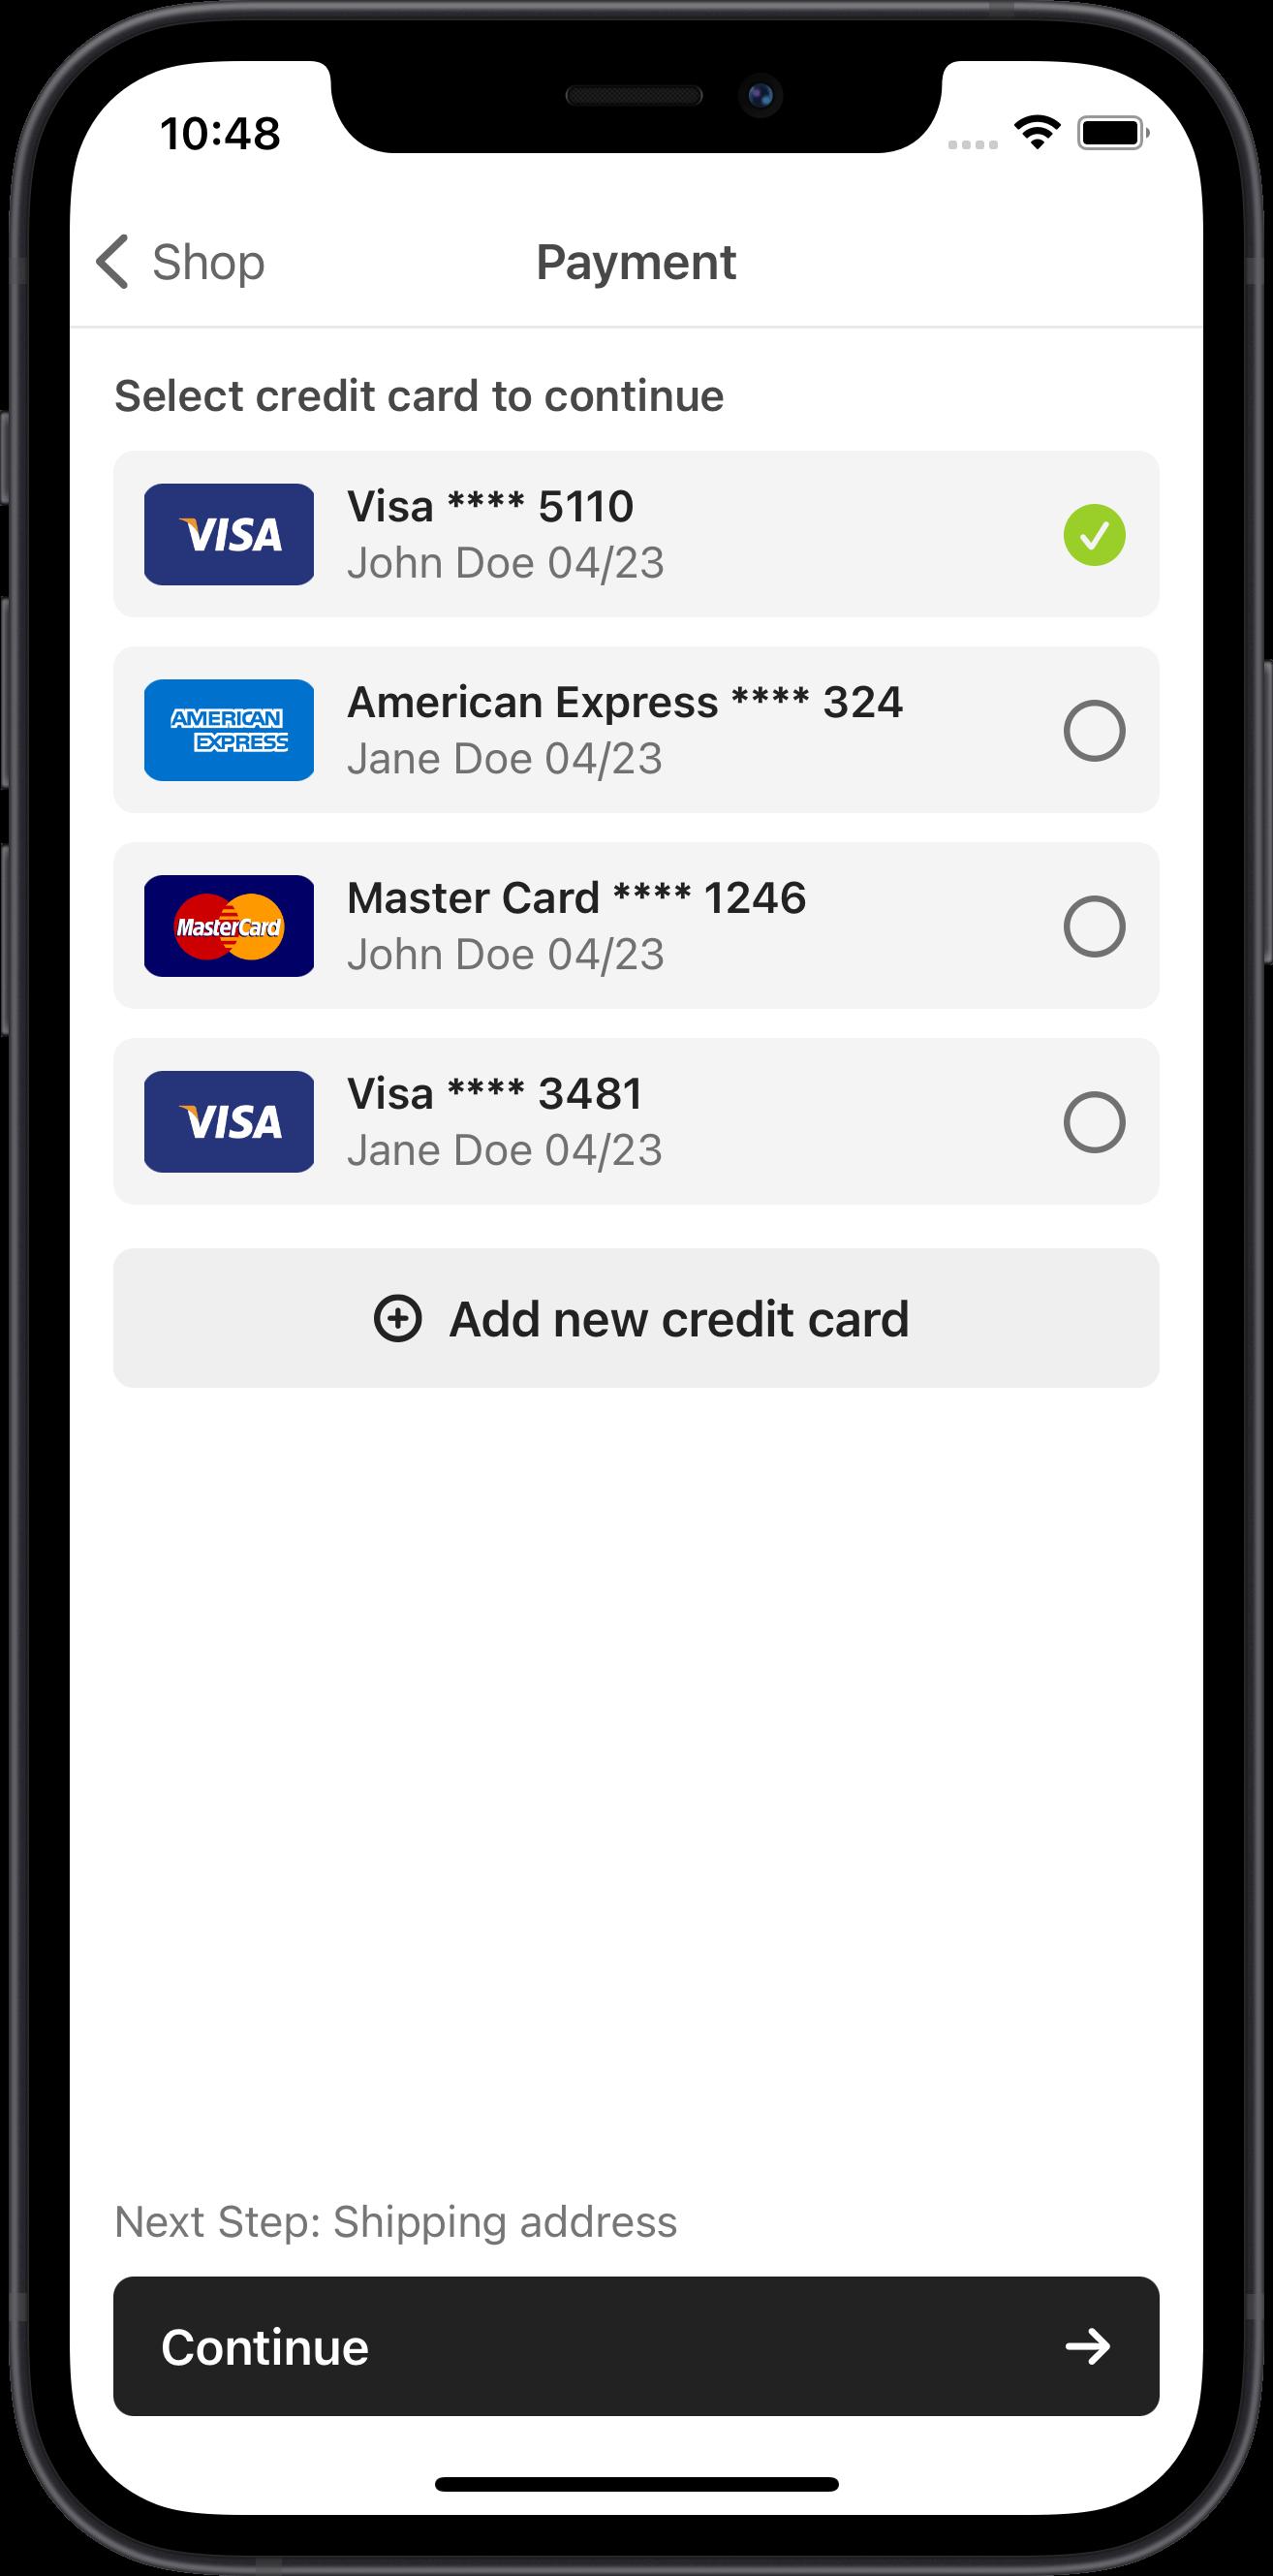 e-commerce, payment, visa, master card, apple